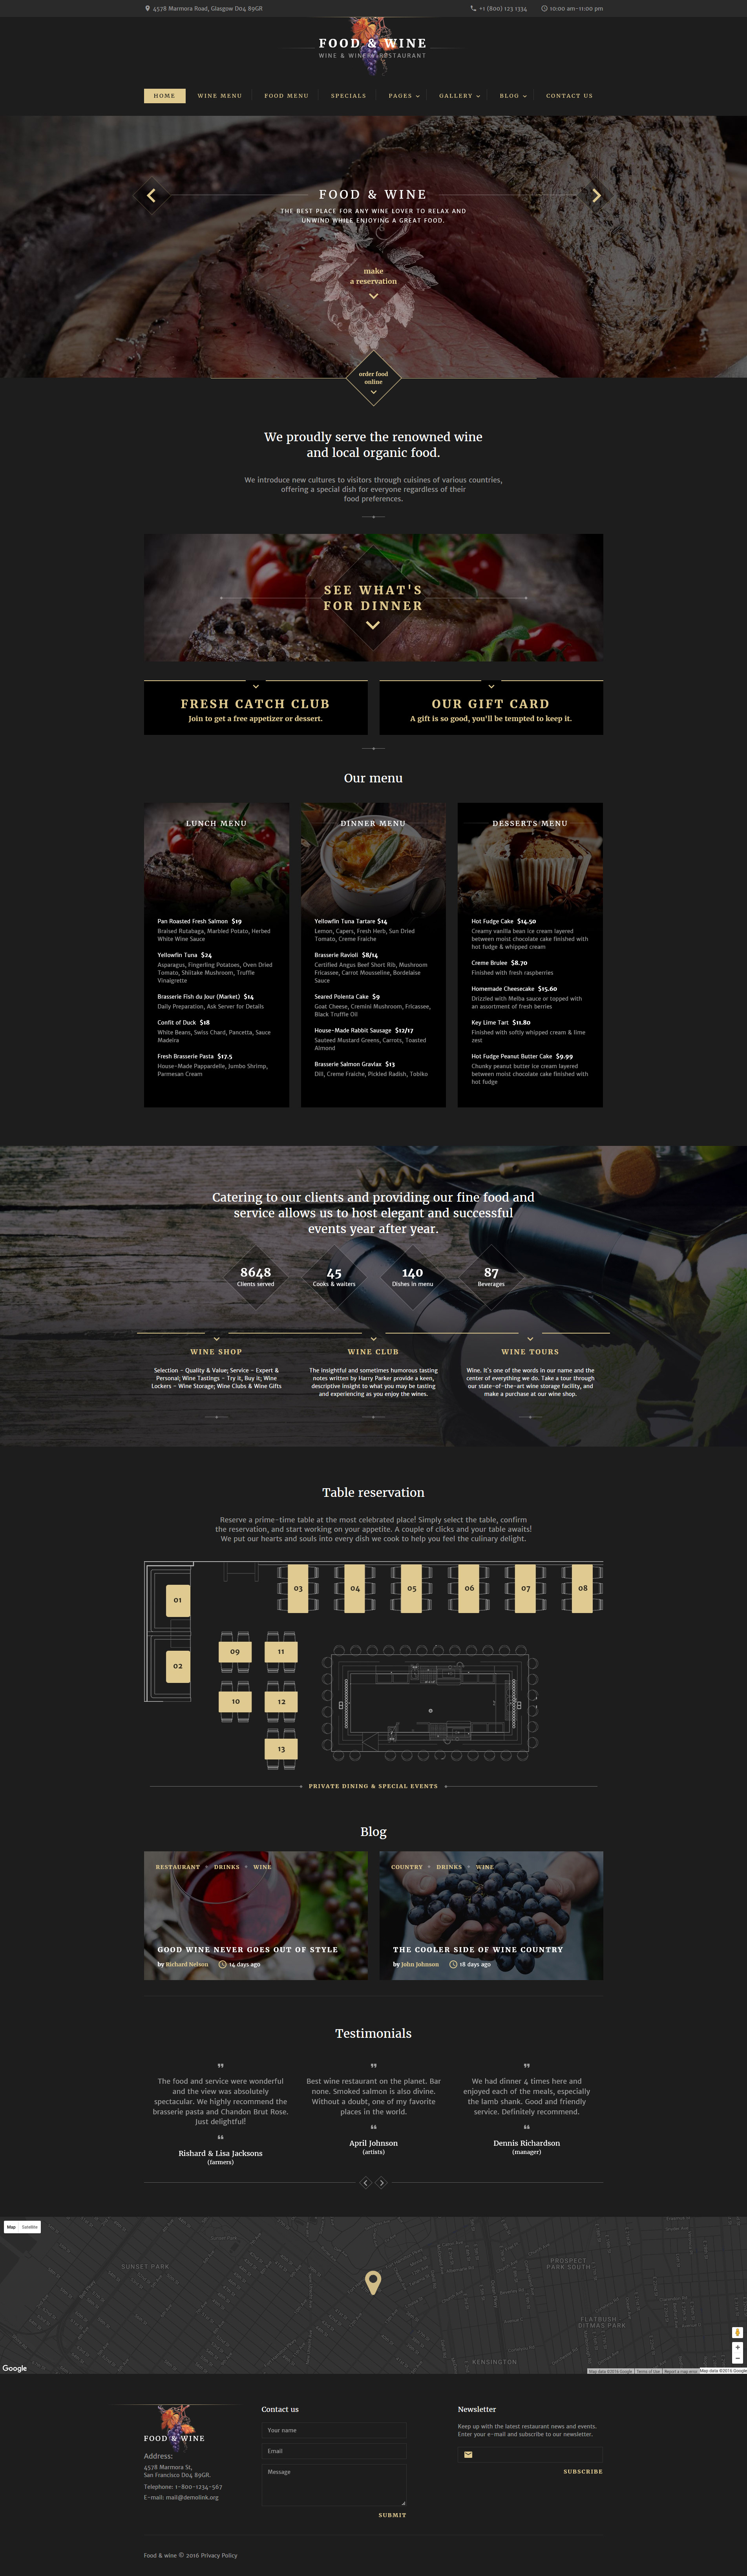 """Repas & Vin"" modèle web adaptatif #60038 - screenshot"